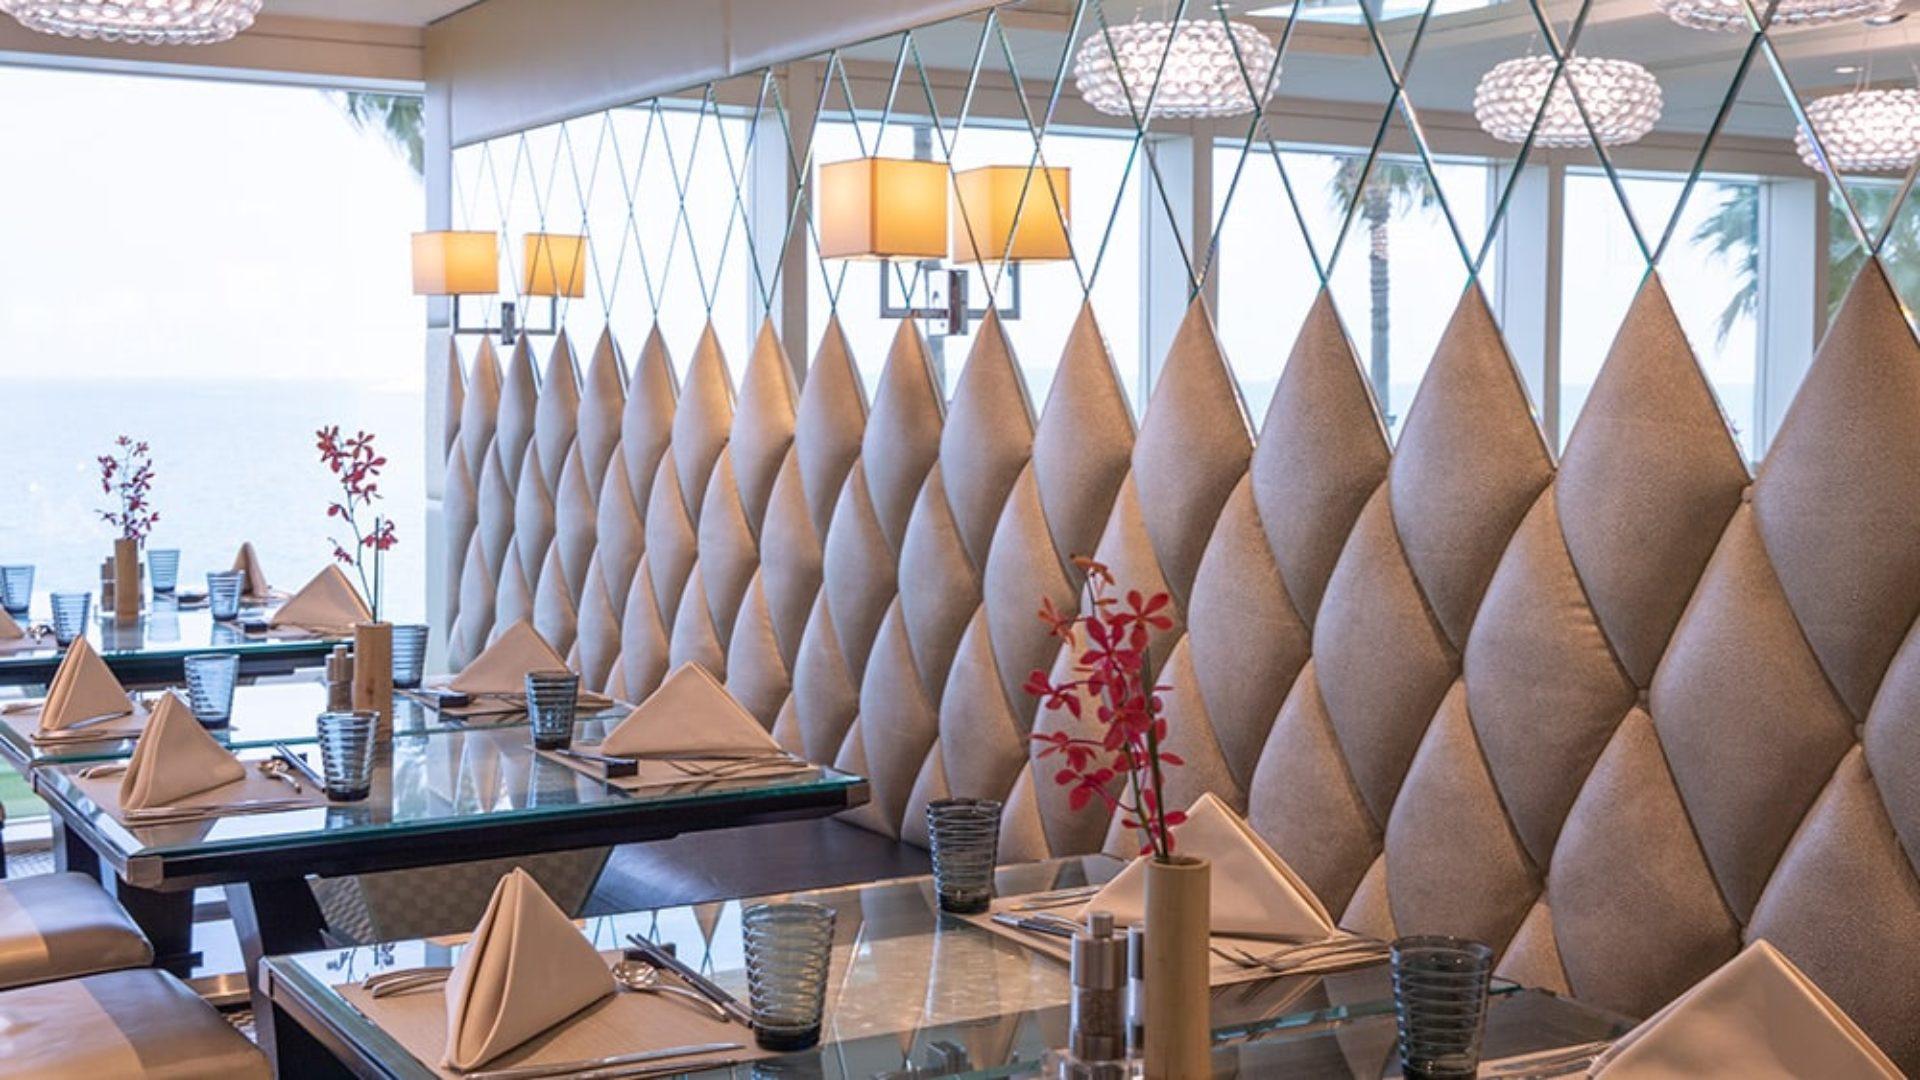 Tables at Junsui Restaurant at the Burj Al Arab